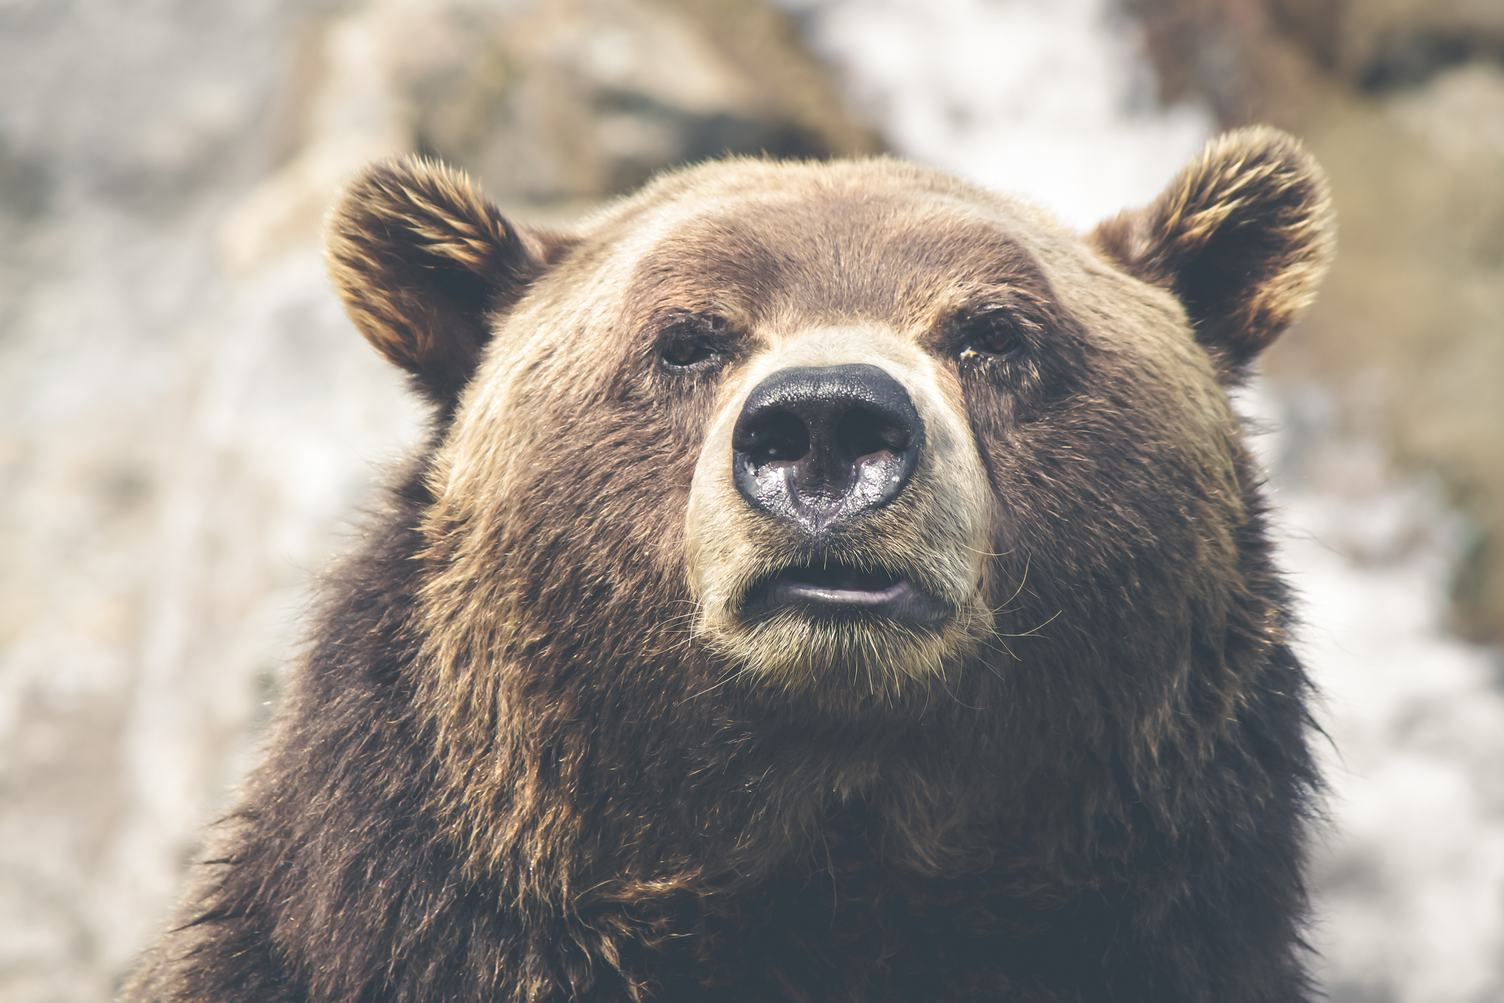 Closeup Portrait of a Brown Bear